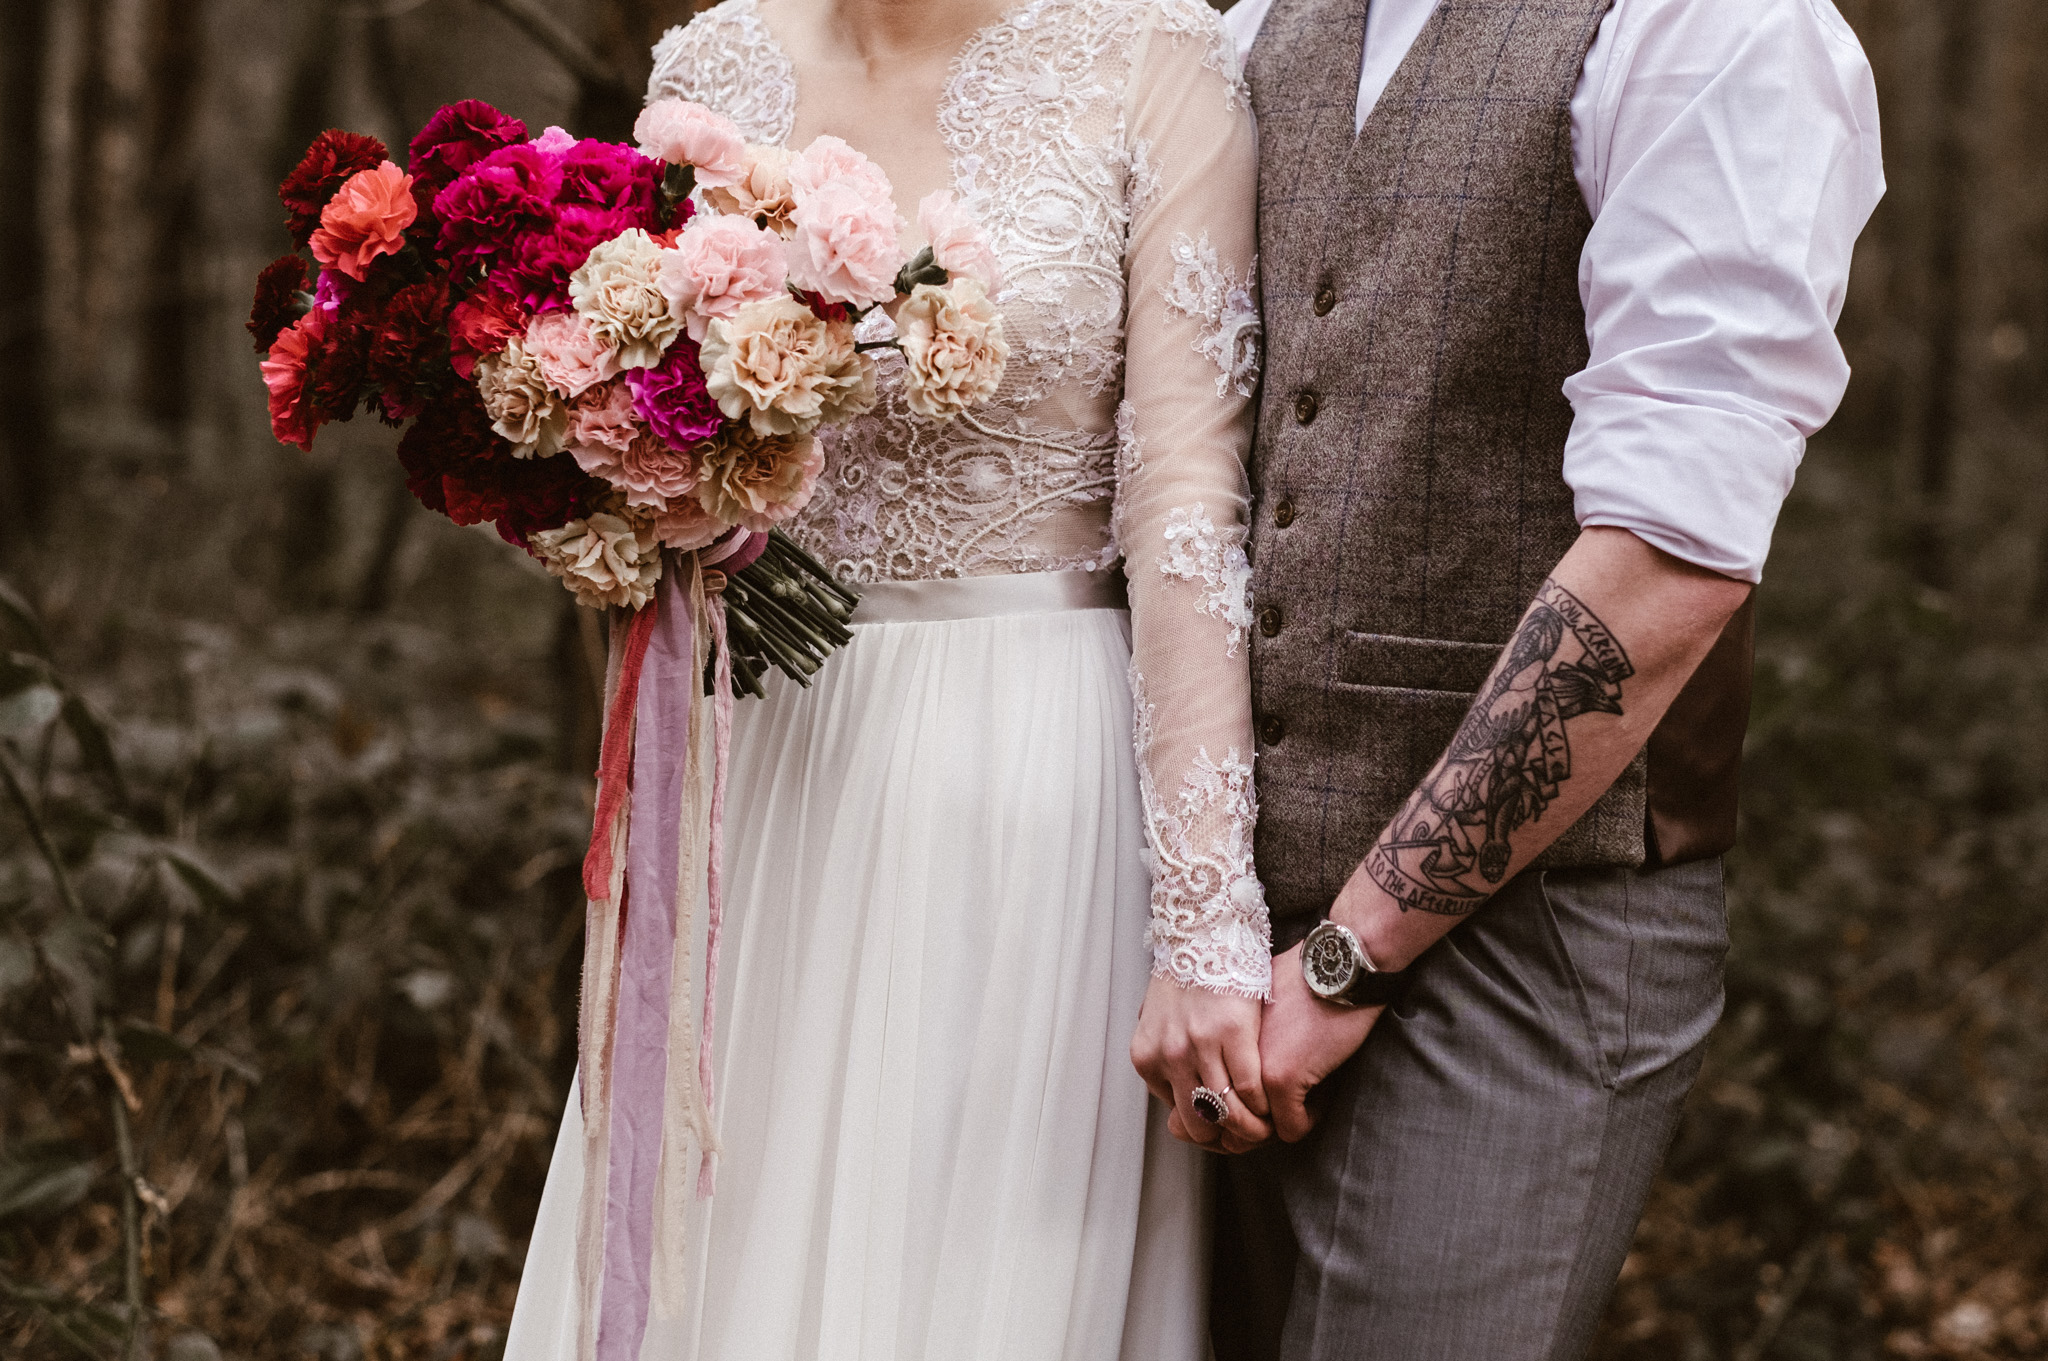 Captains-Wood-Barn-Alterative-Rustic-Vintage-Essex-Wedding-Suffolk-Grace-Elizabeth-22.jpg